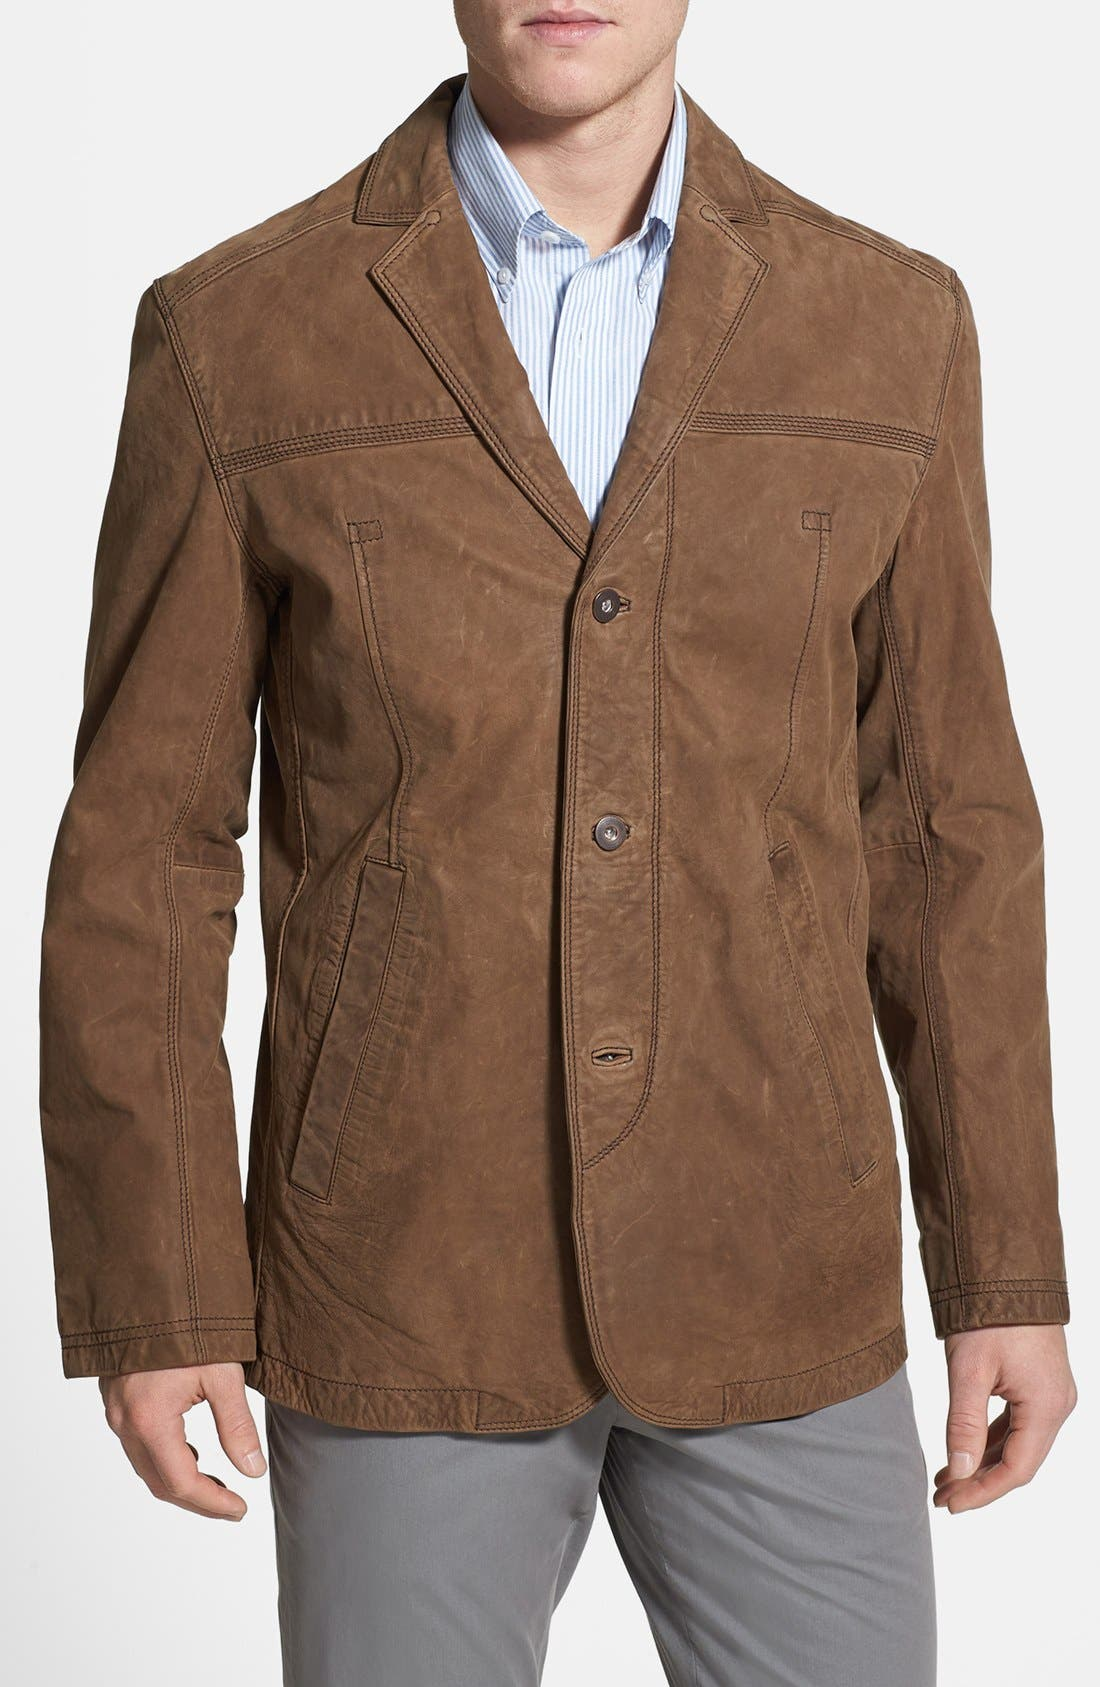 Alternate Image 1 Selected - Timberland 'Bayview' Nubuck Leather Sport Coat